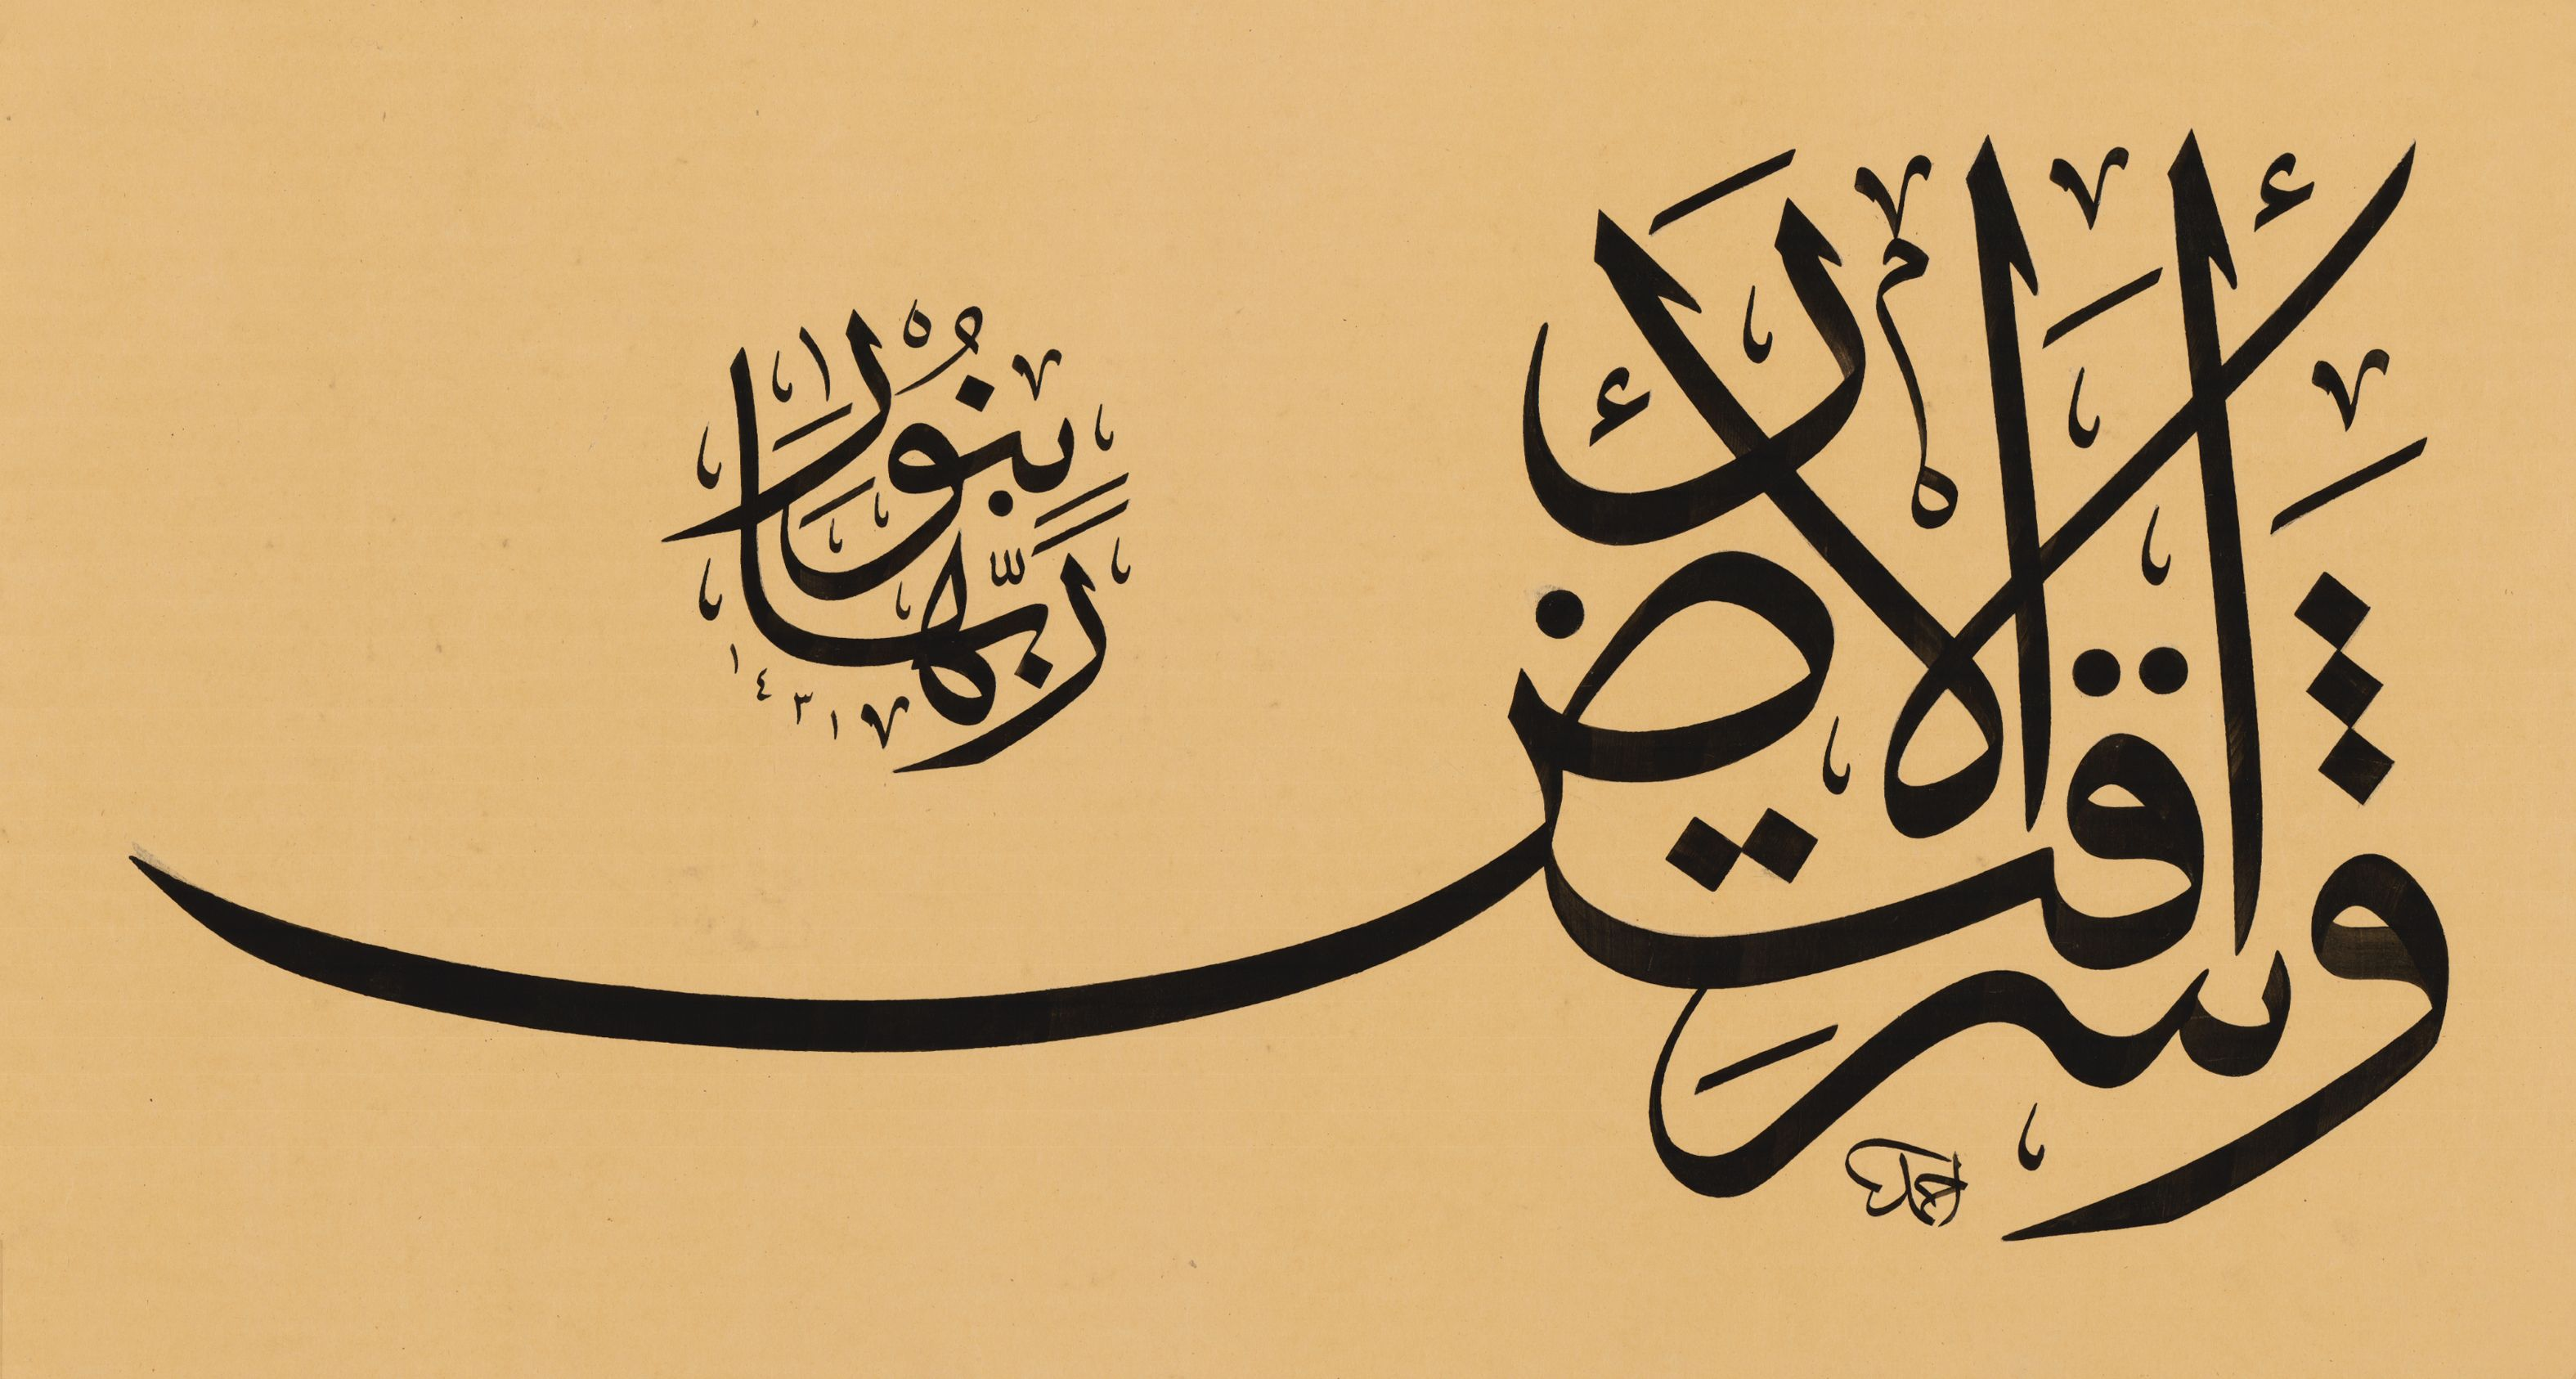 Pin By Zaha Gamal On أقوال وحكم Quotes Islamic Art Calligraphy Islamic Calligraphy Arabic Calligraphy Painting